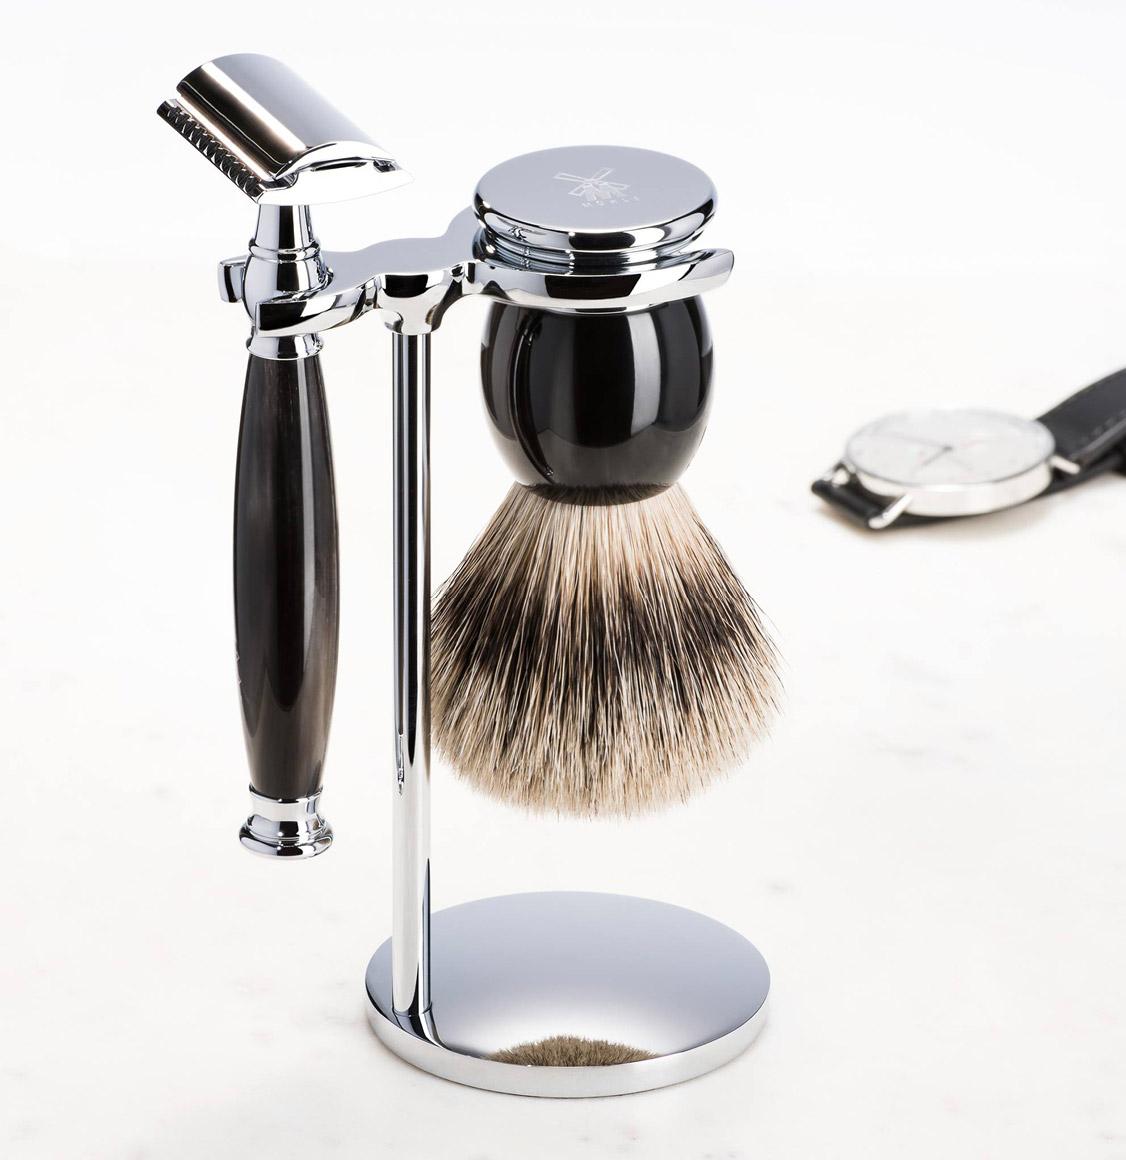 Muhle Stand For Shaving Set